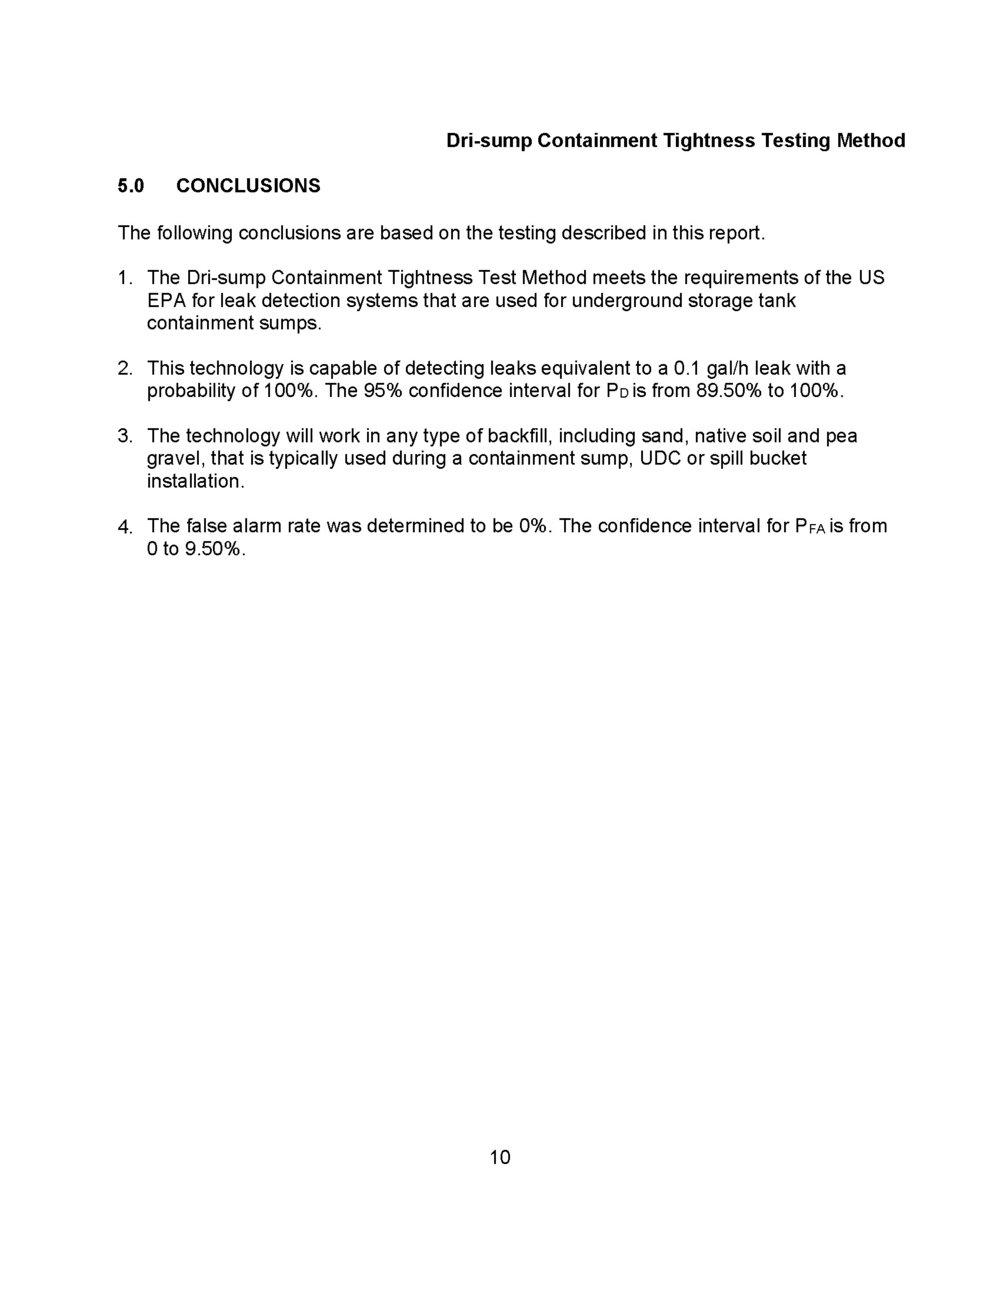 KWA Final Report Dri Sump 12 19 2018_Page_14.jpg